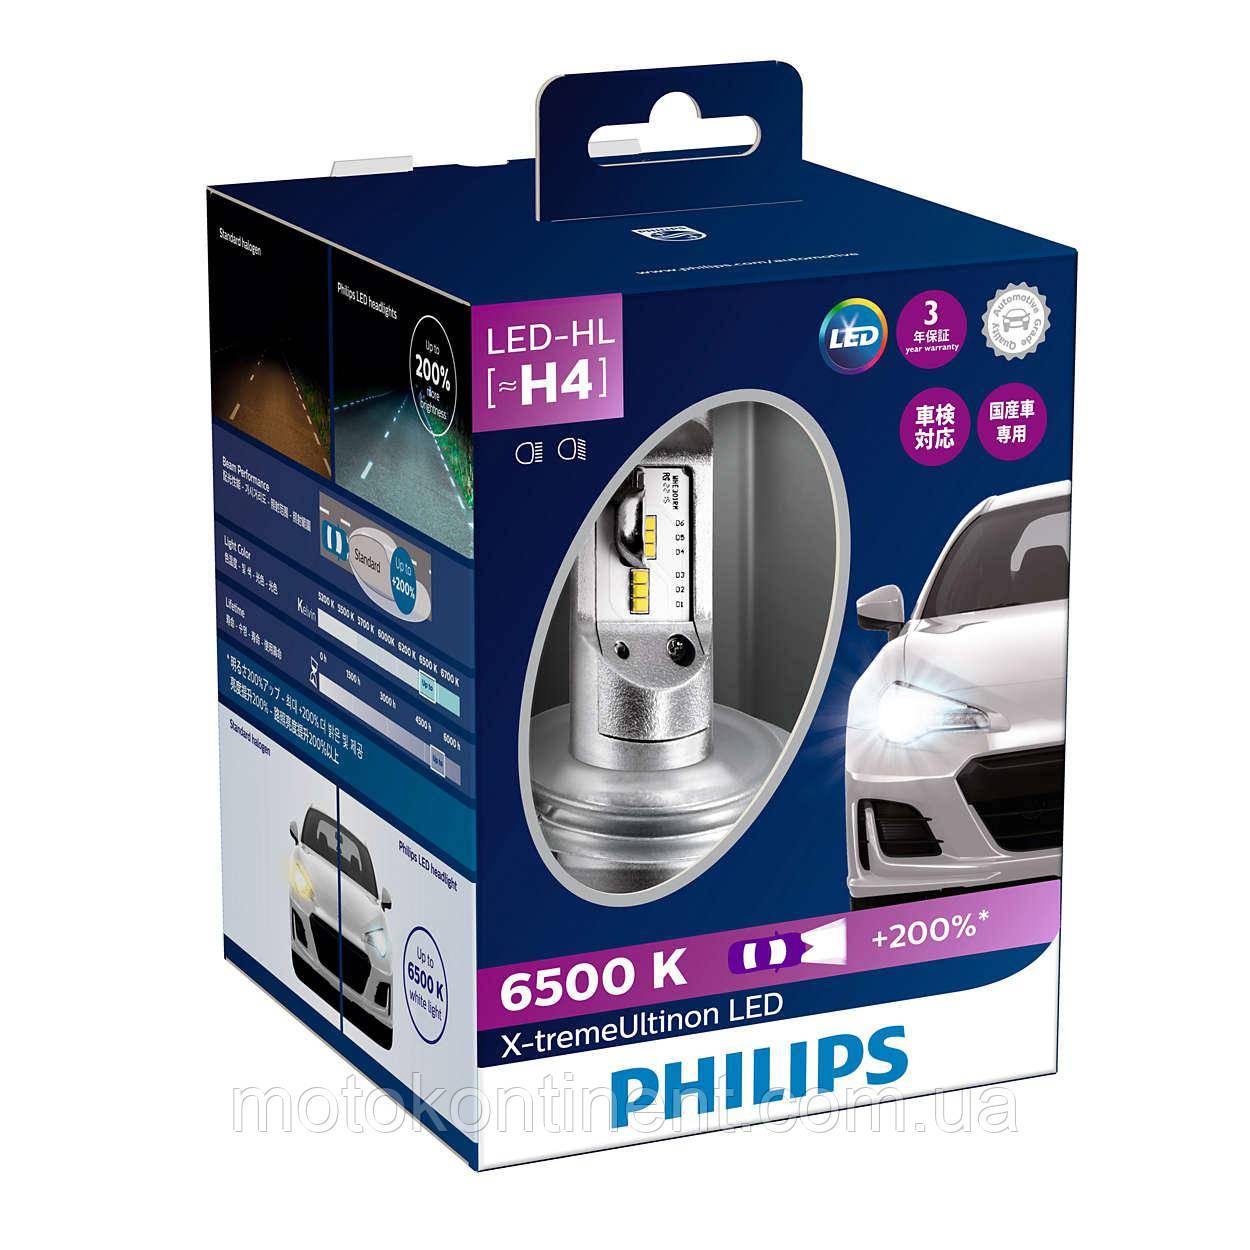 PHILIPS LED H4 Cветодиодные лампы PHILIPS в ПТФ H4 X-treme Ultinon LED Fog 6500K 12901HPX2